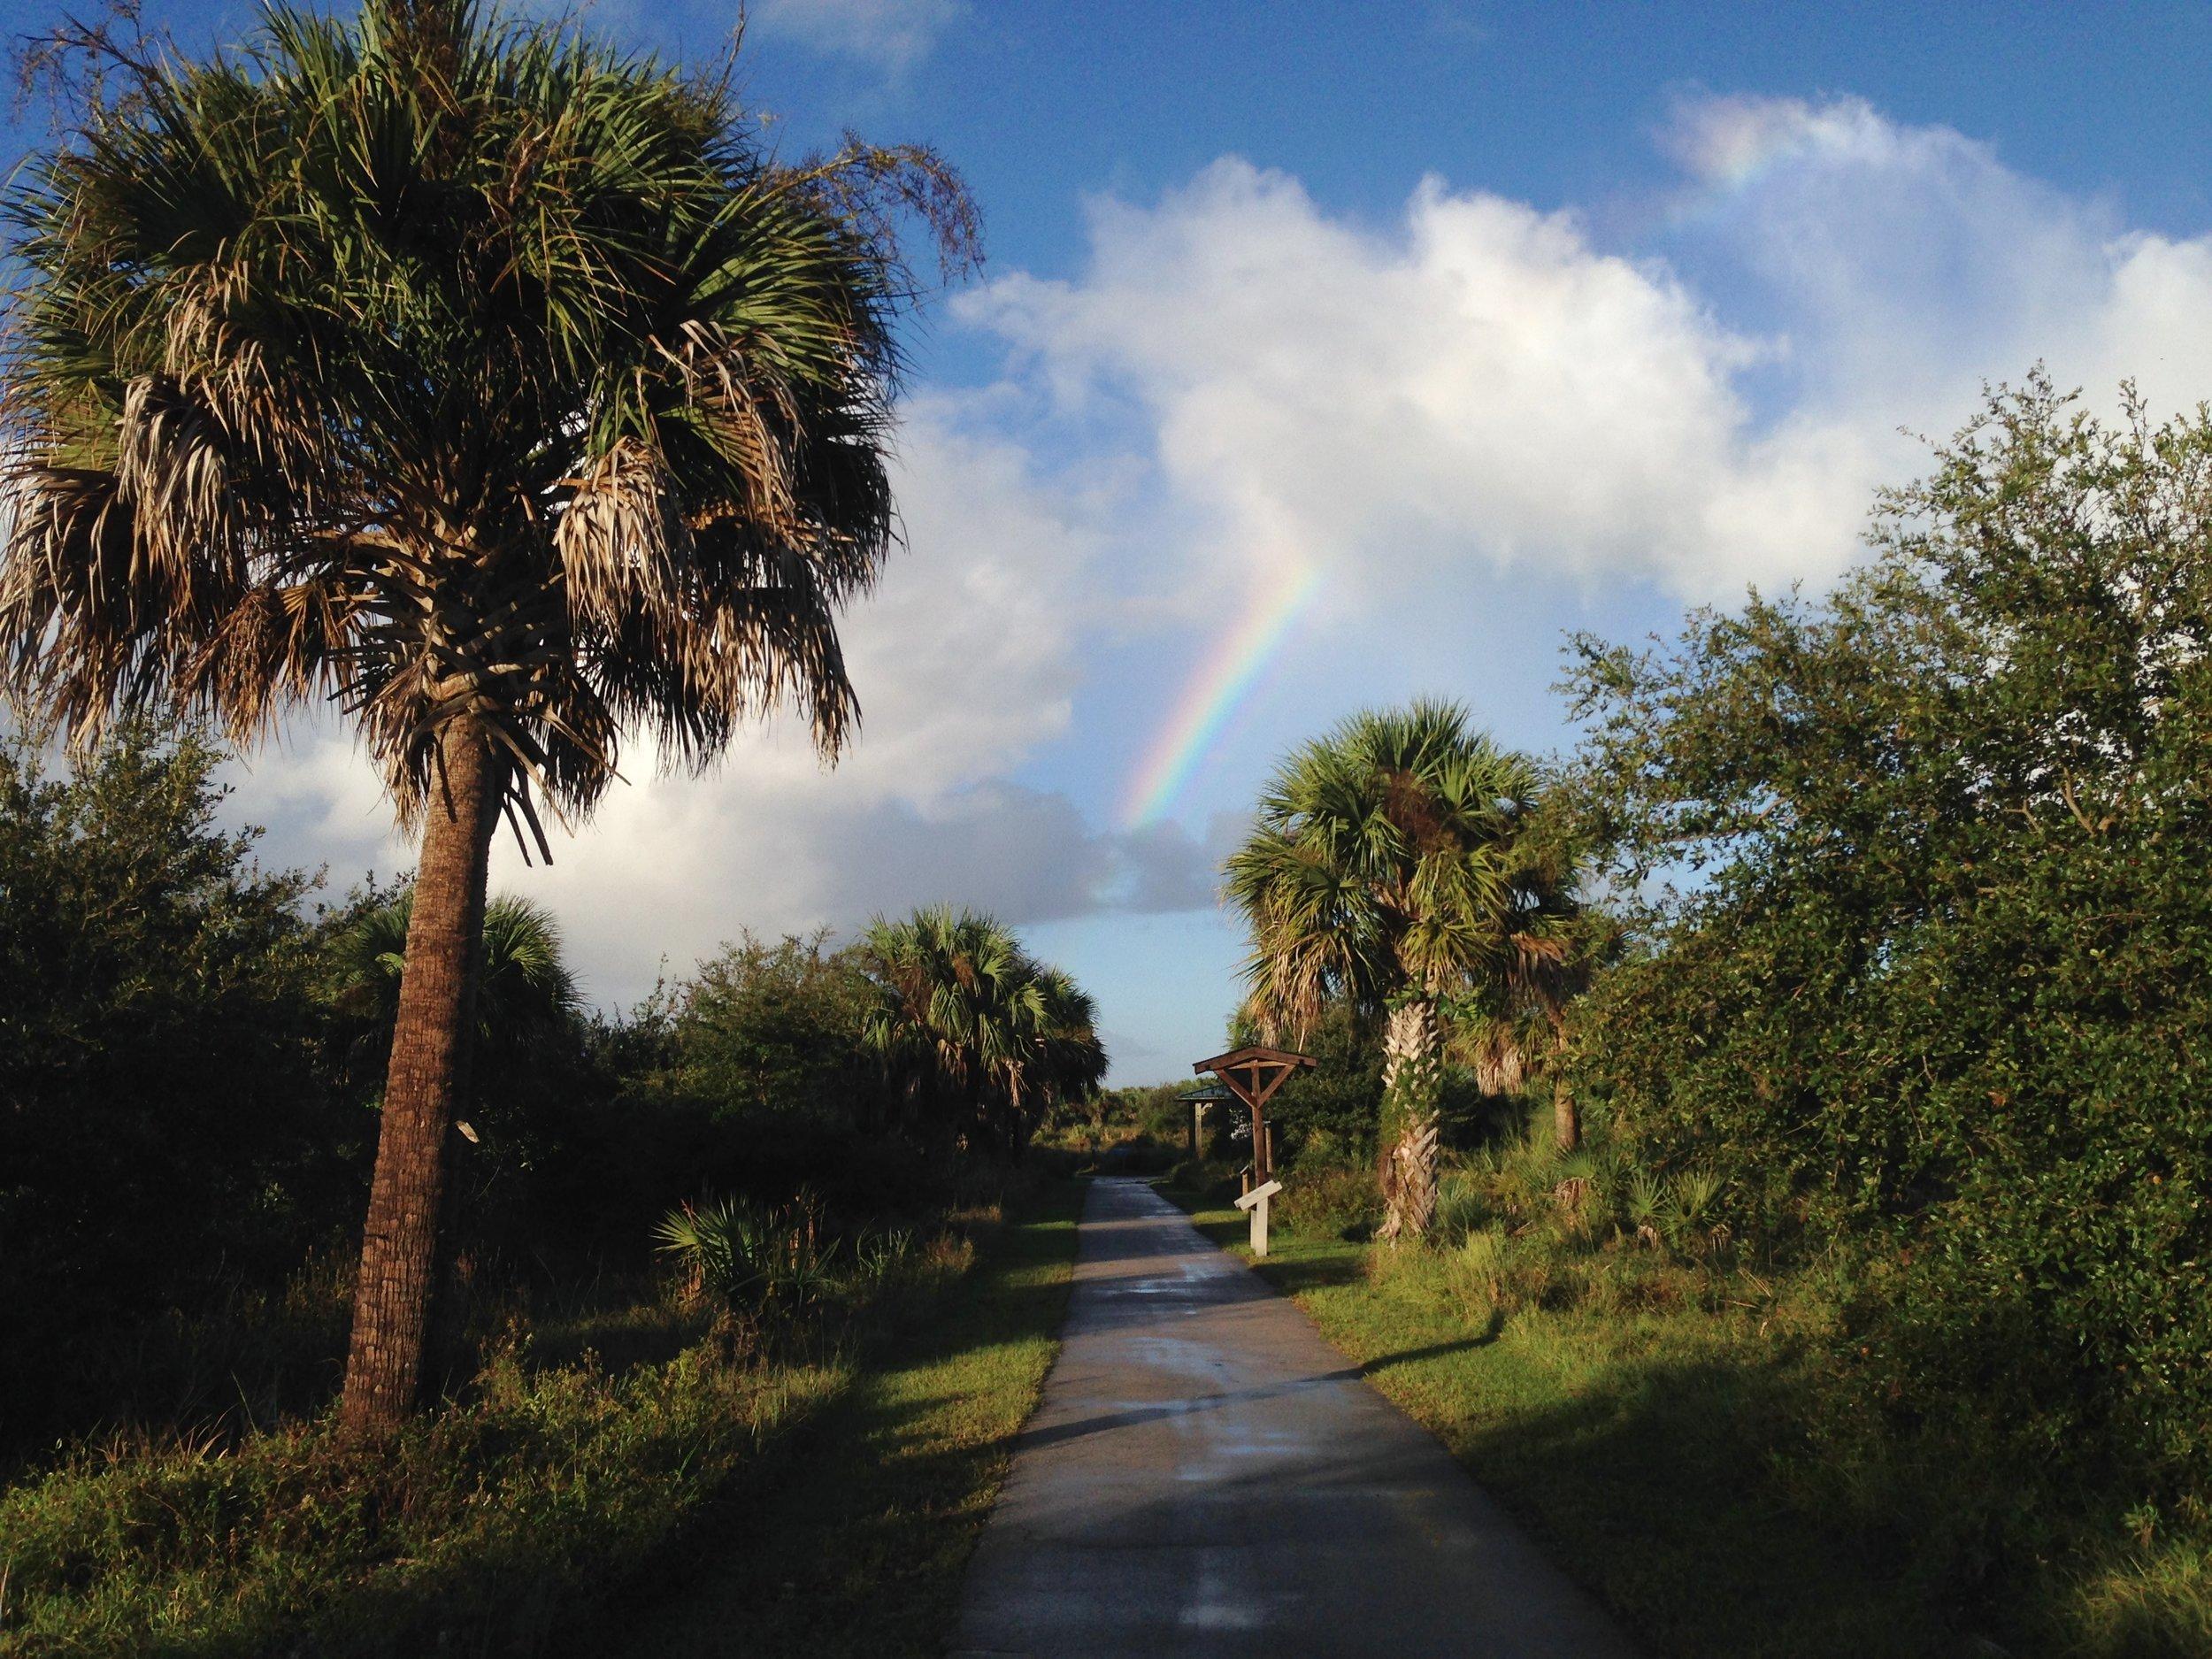 Photo: Sandee & Steve Dawdy, USFWS Volunteers, Everglades Headwaters NWR